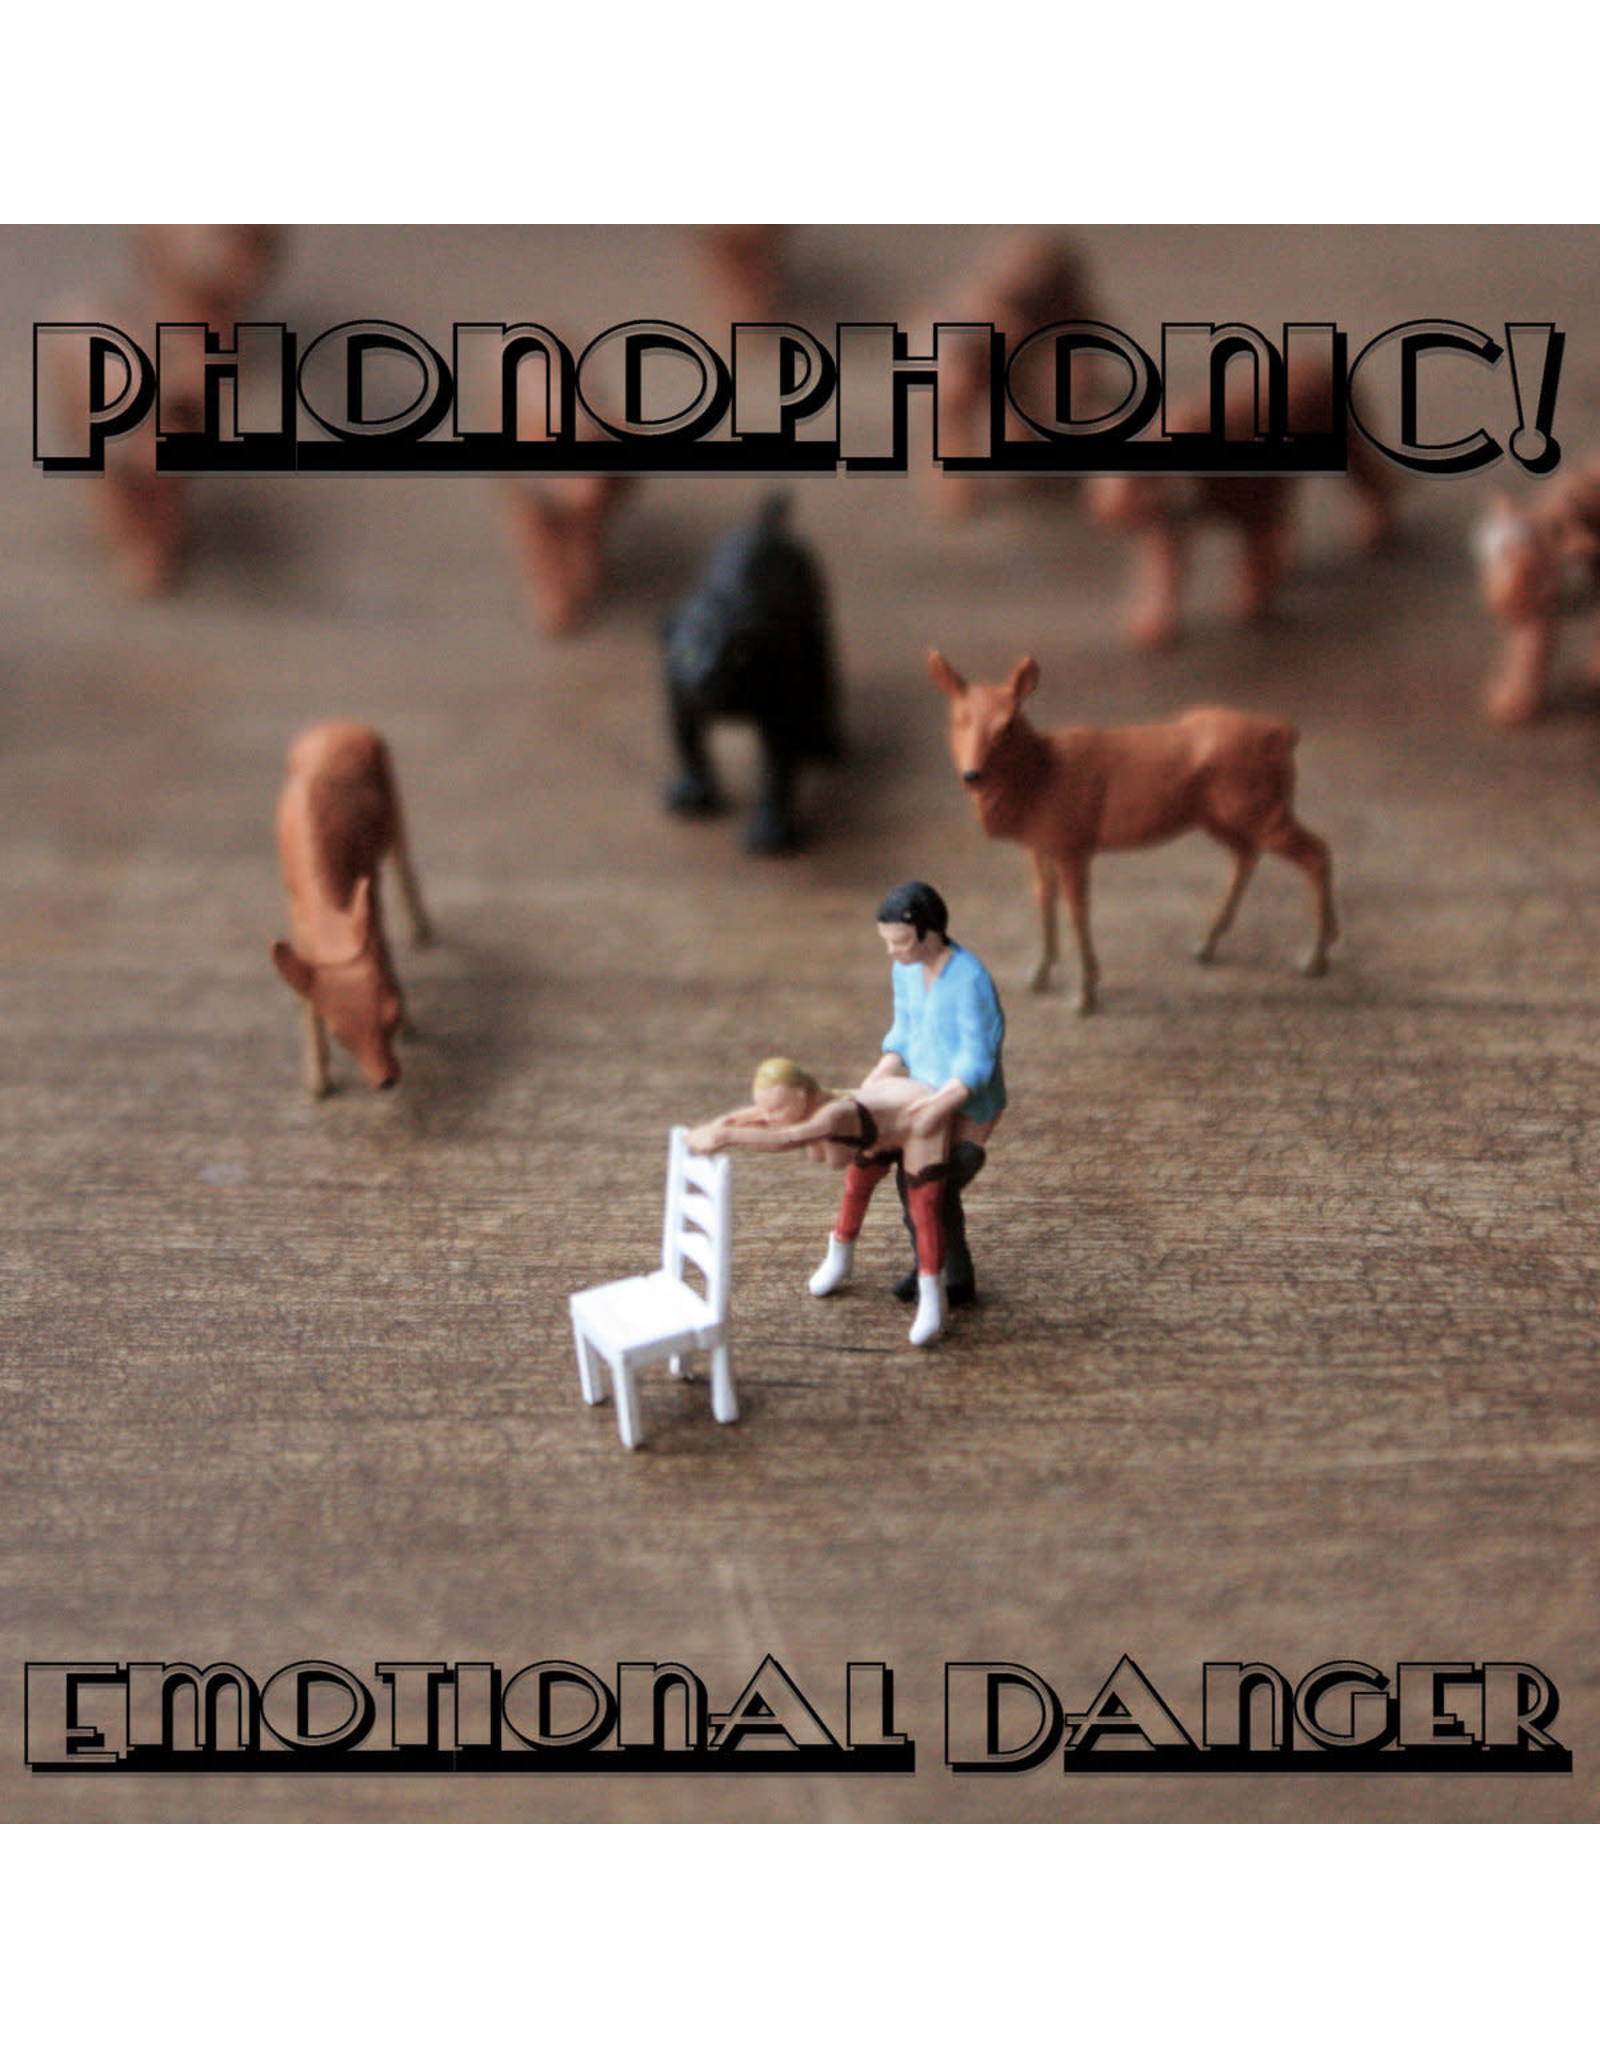 Phonophonic - Emotional Danger CD